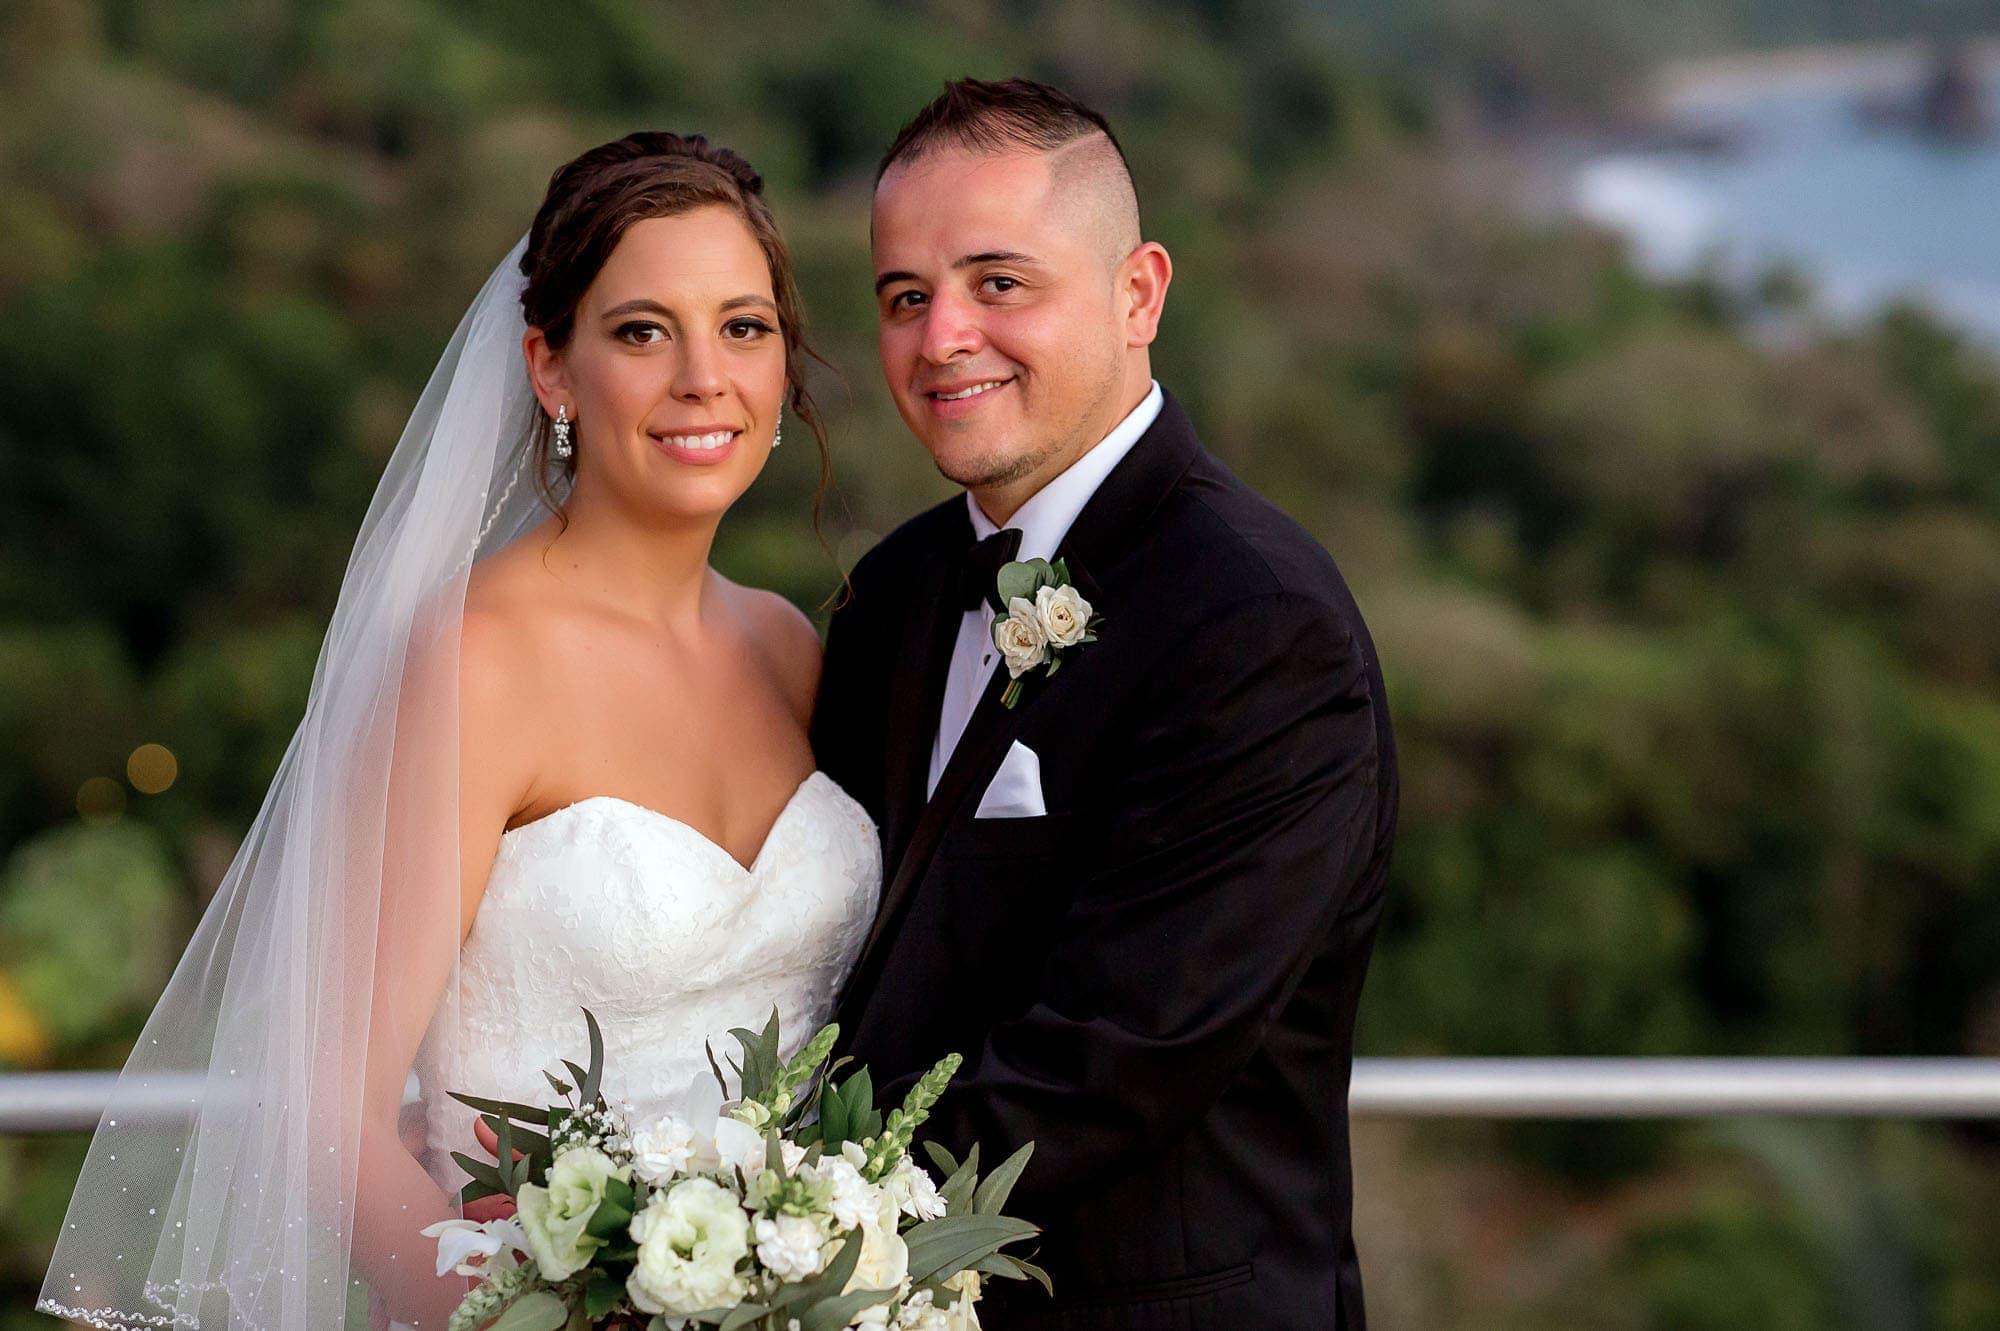 Bride and groom formal portrait